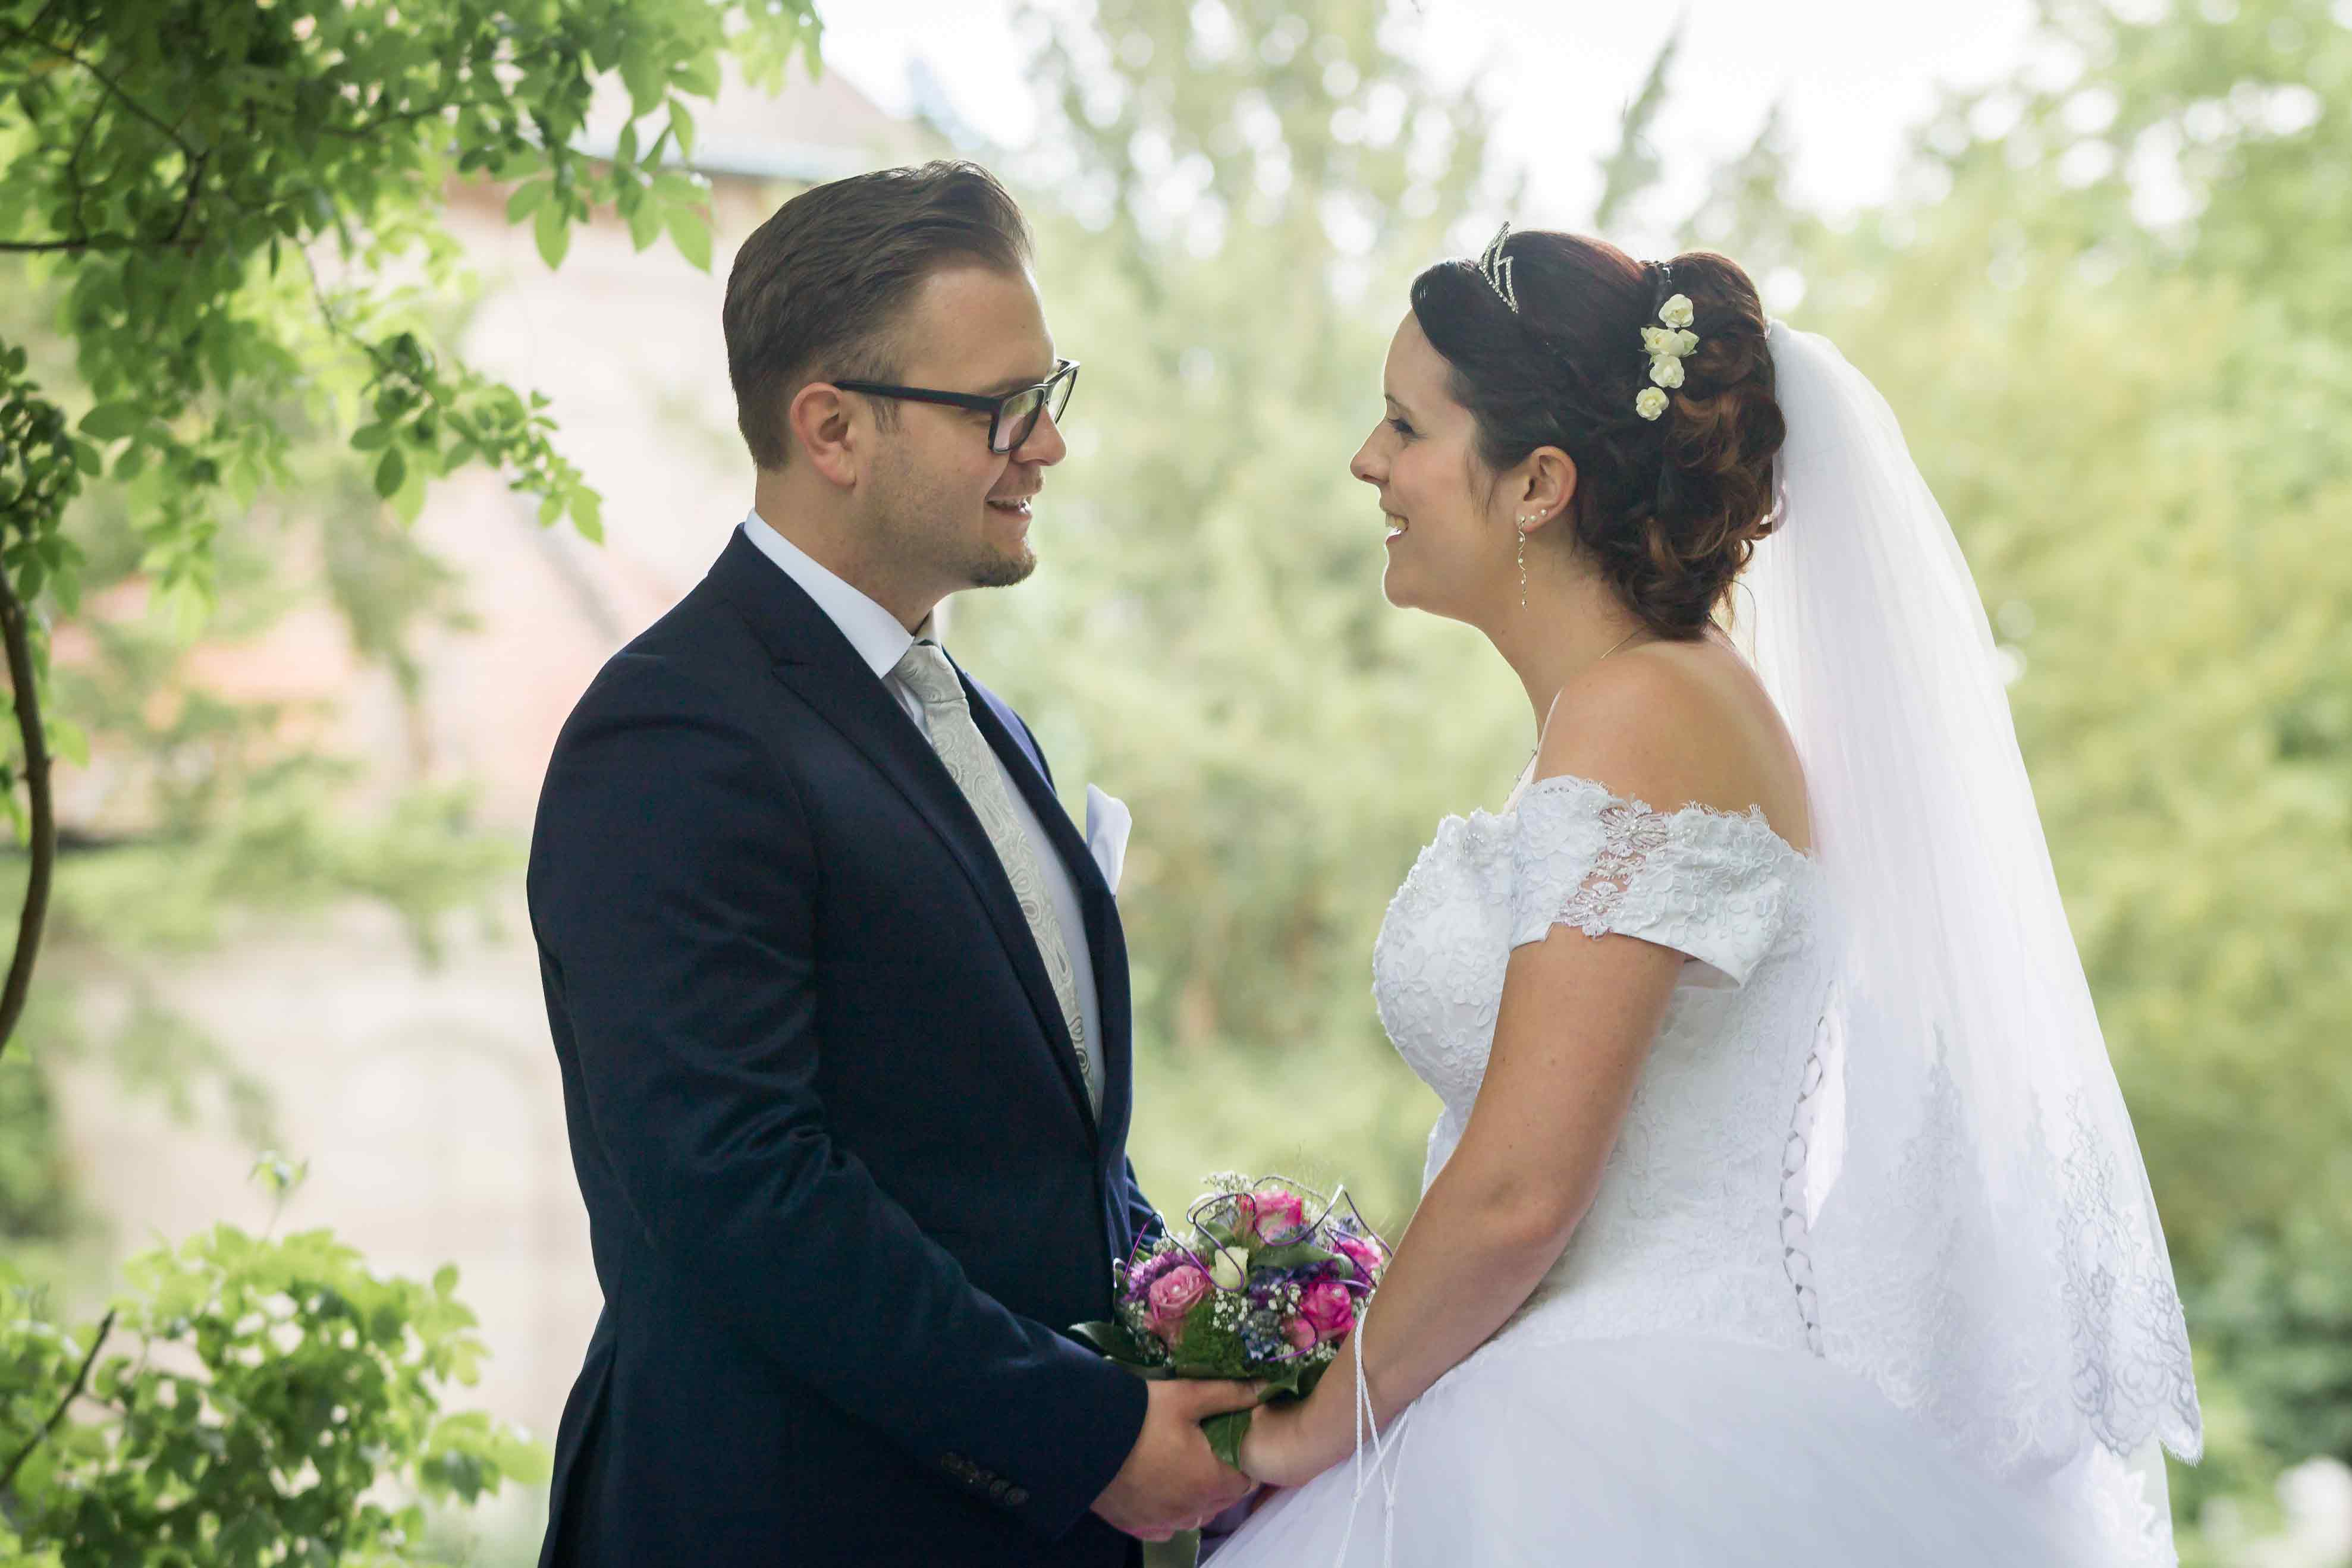 Hochzeitsfotografie-2275w